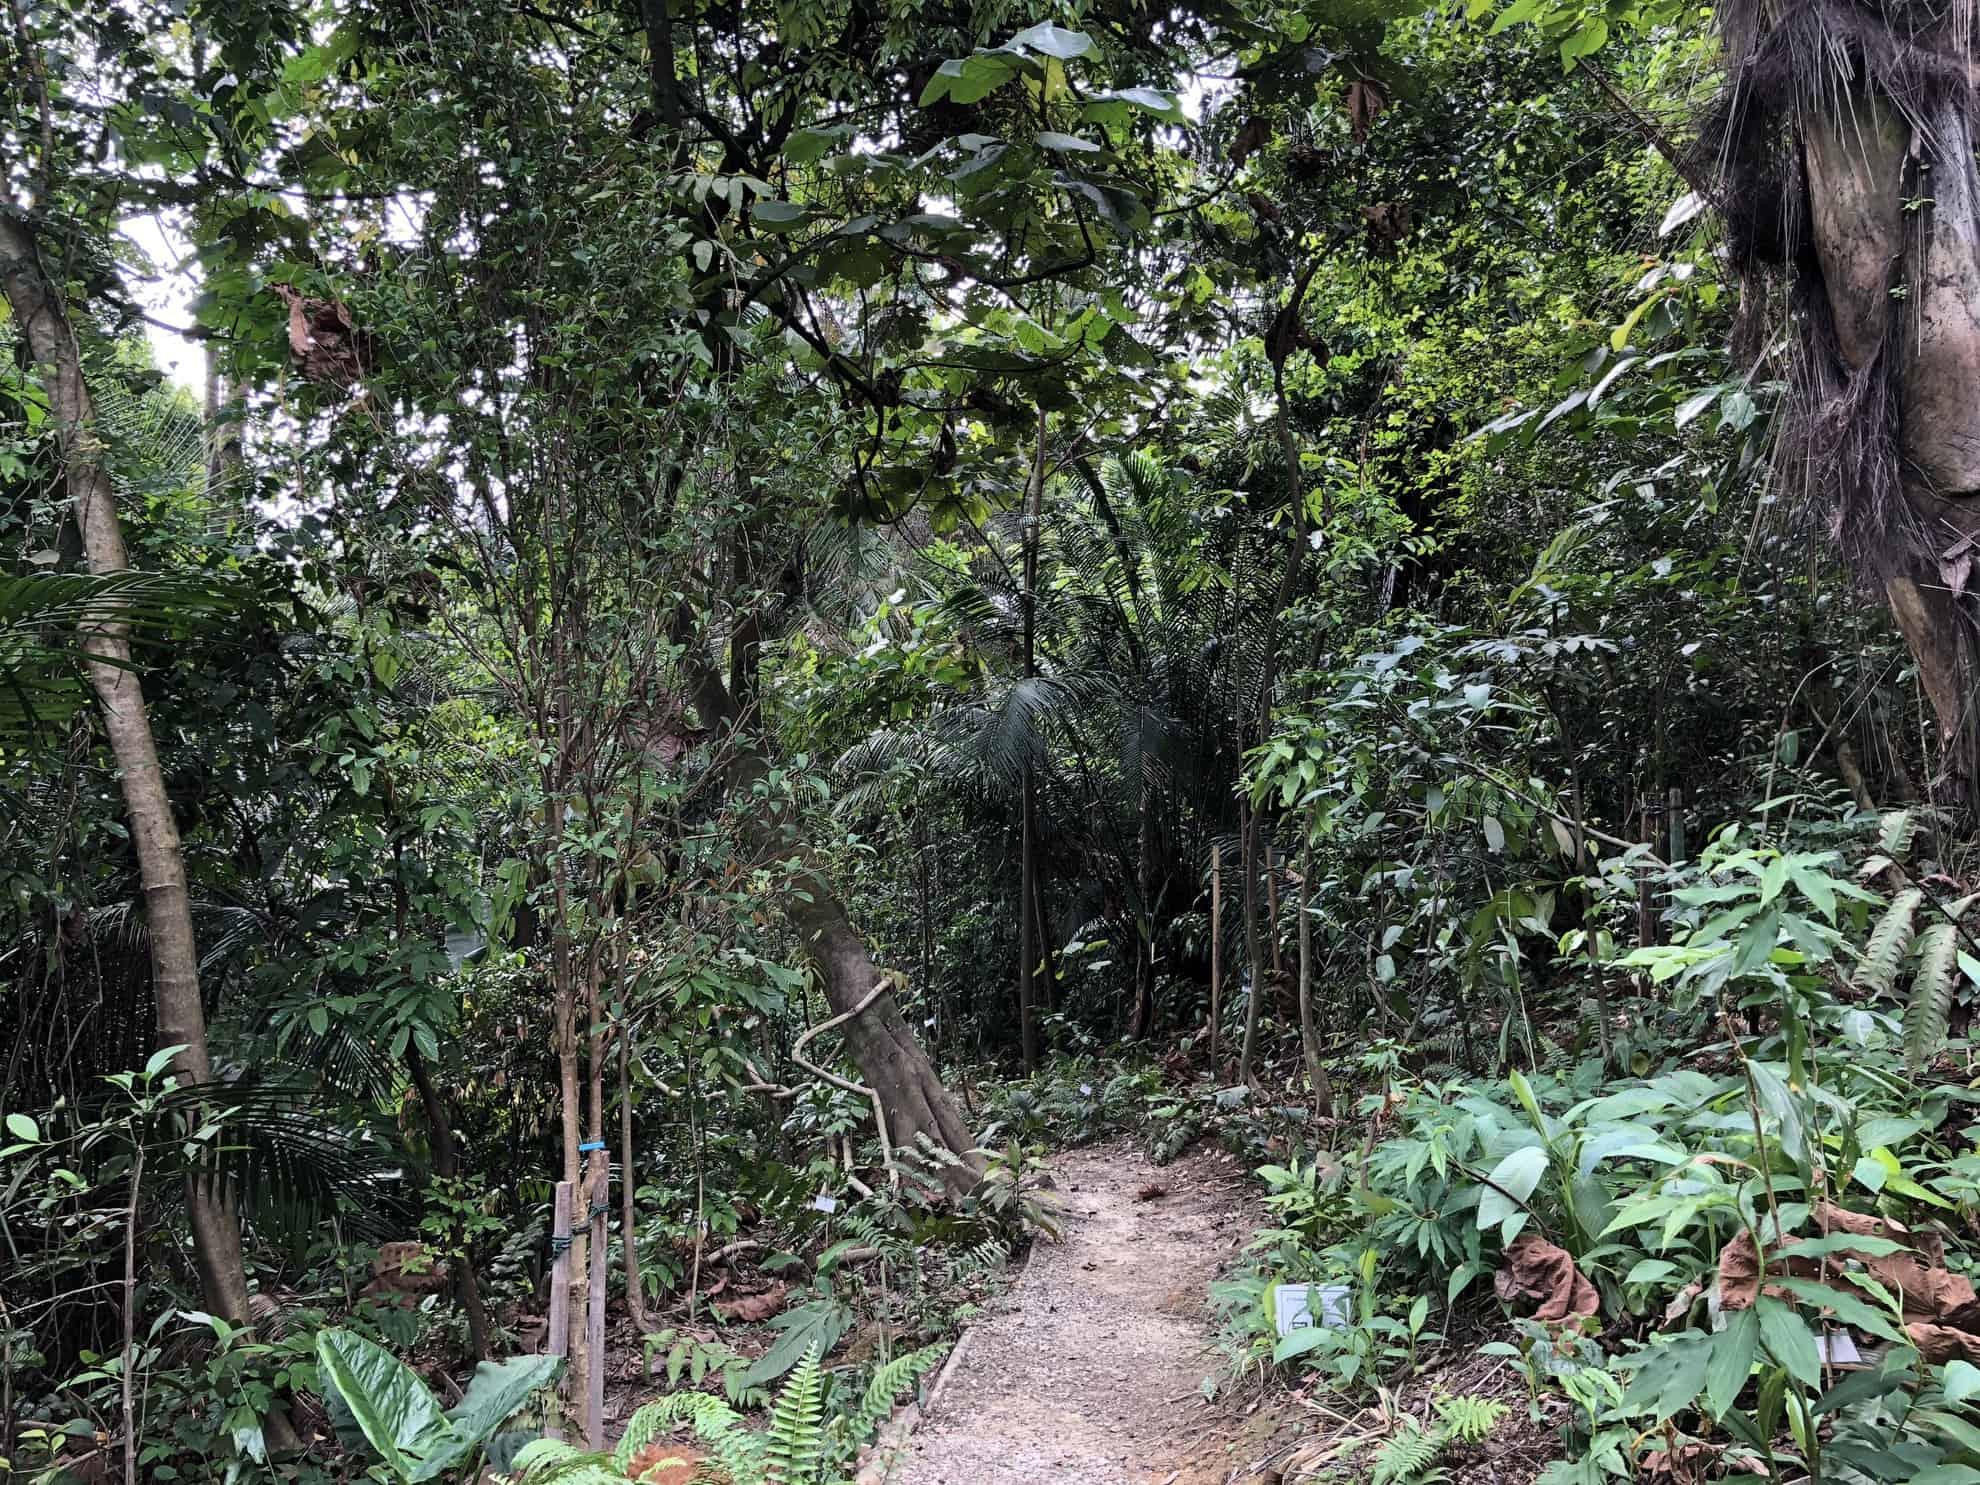 Free Tree Society On-the-Go จะปลูกป่าในเมืองต้องเพาะเมล็ดพันธุ์ในใจคน